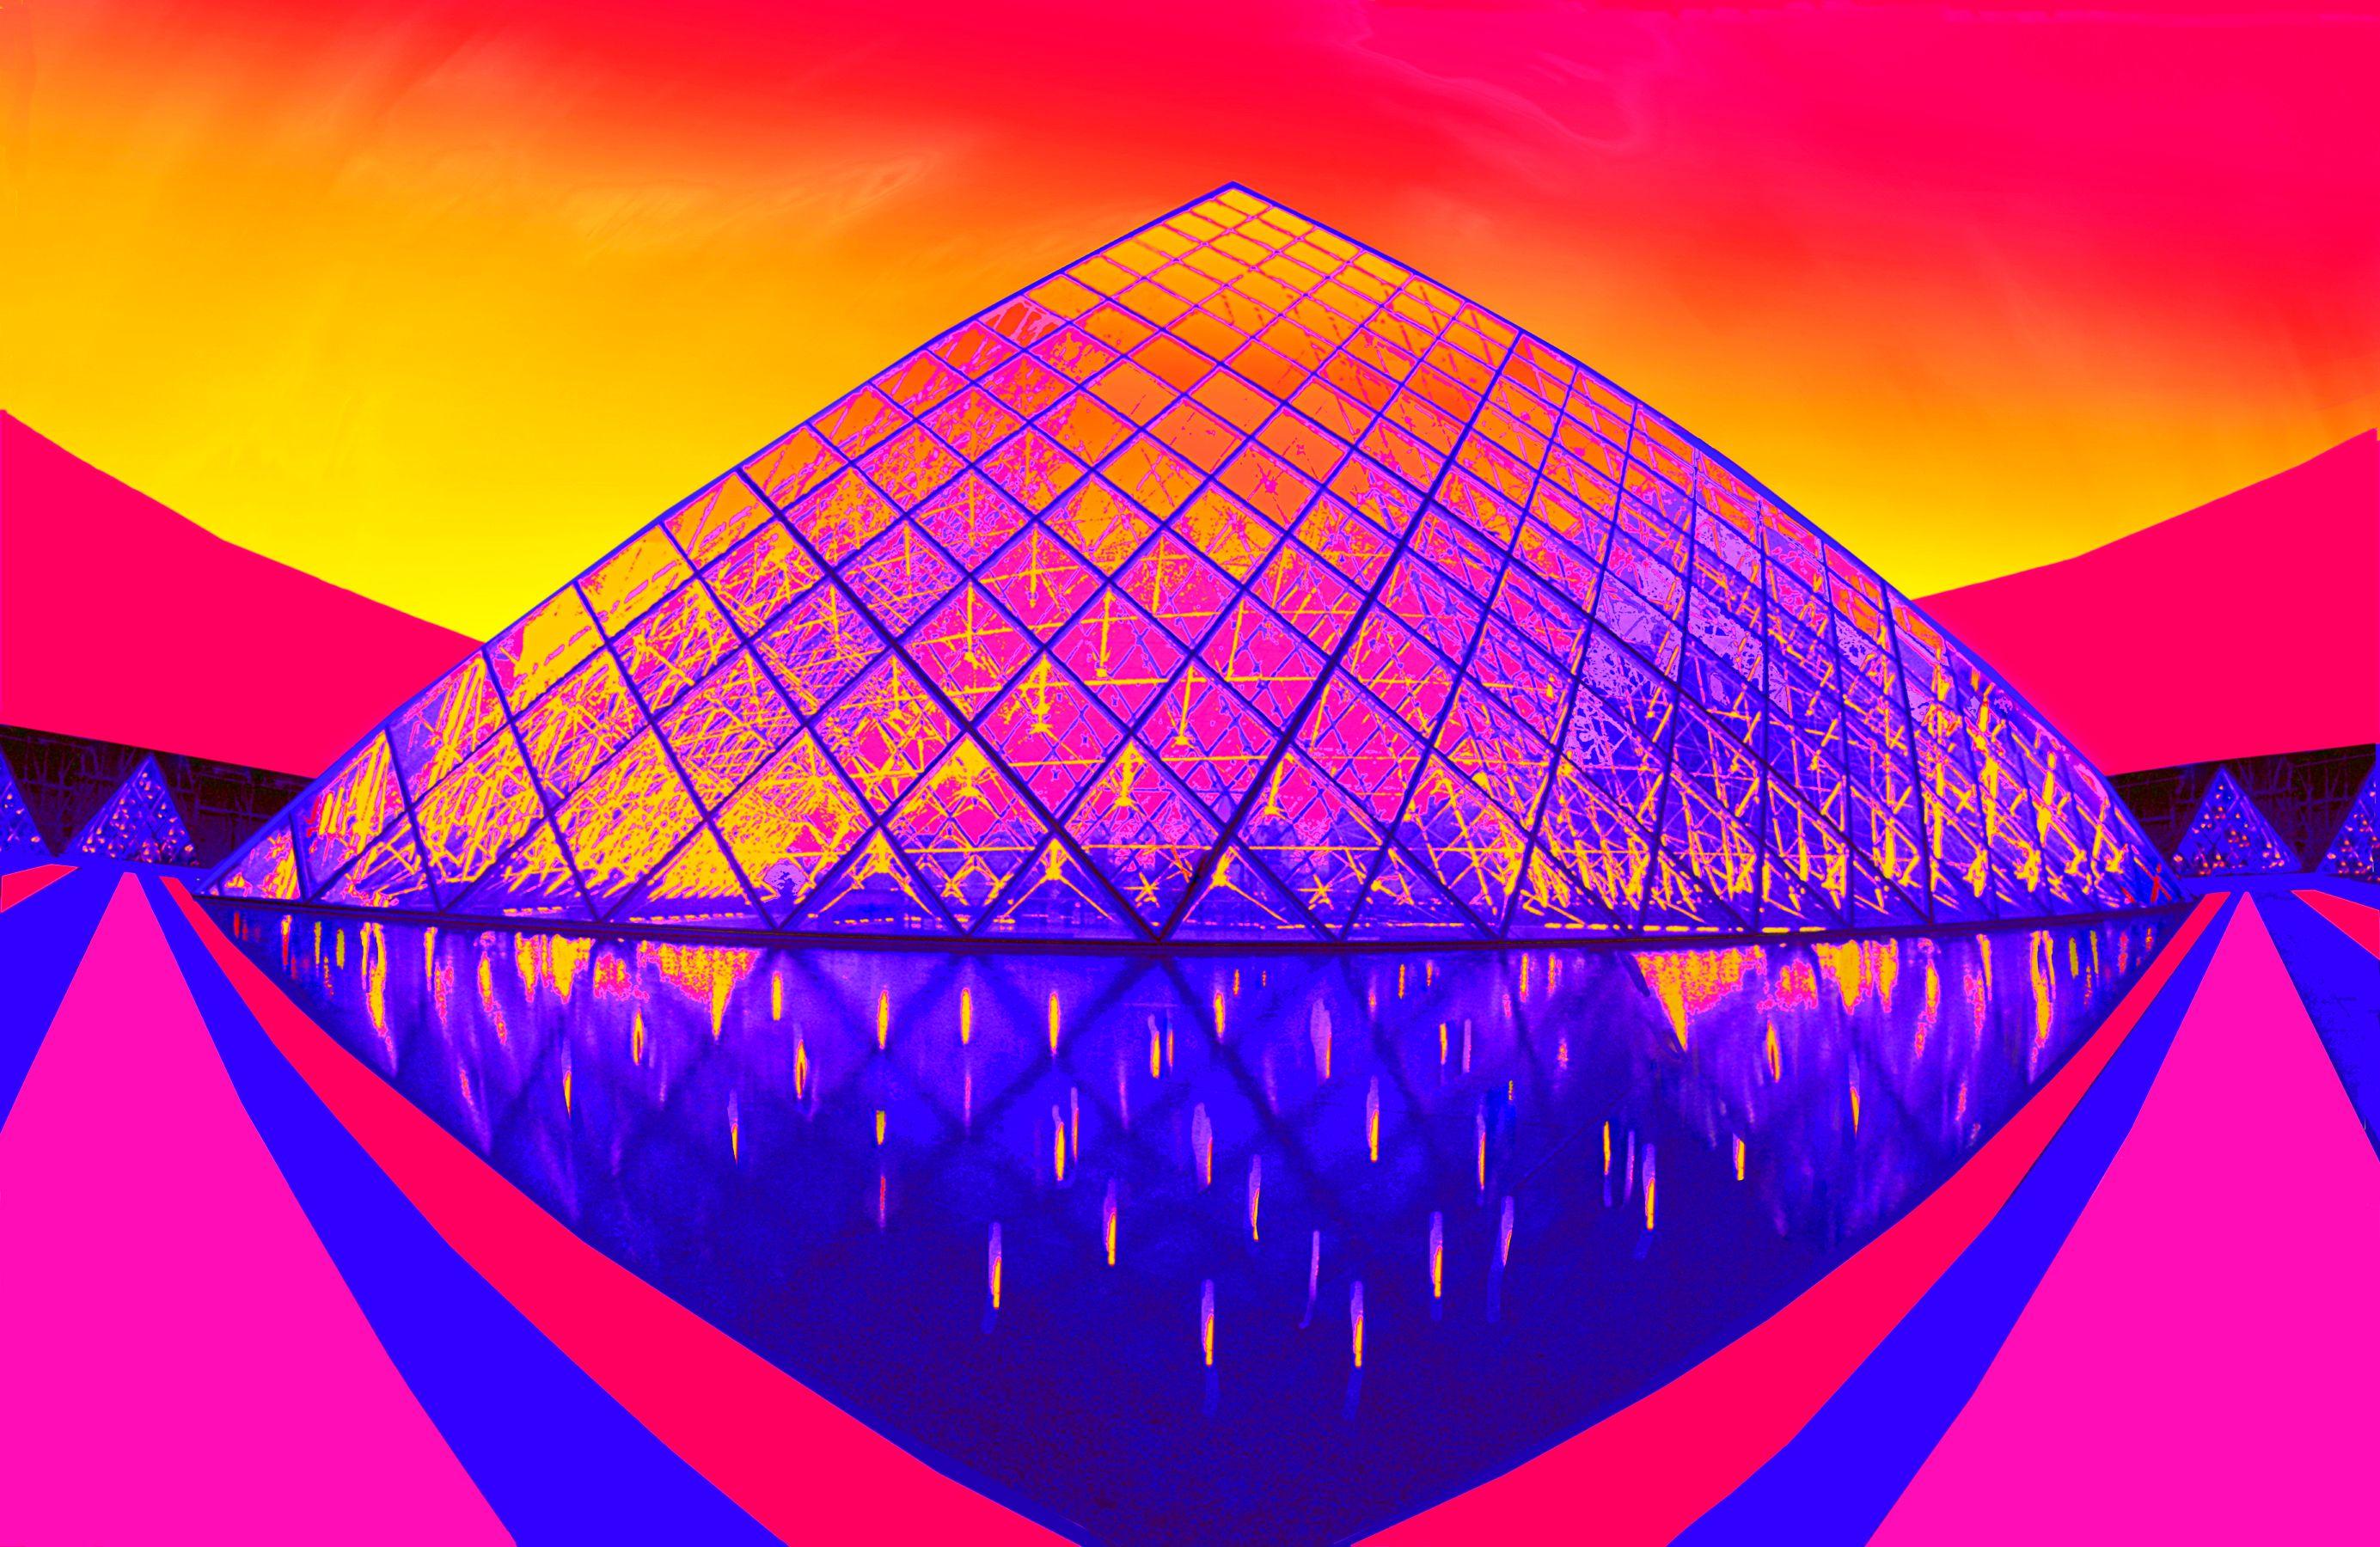 Gottlieb-Paris Pyramid at Dusk lgsm.jpg